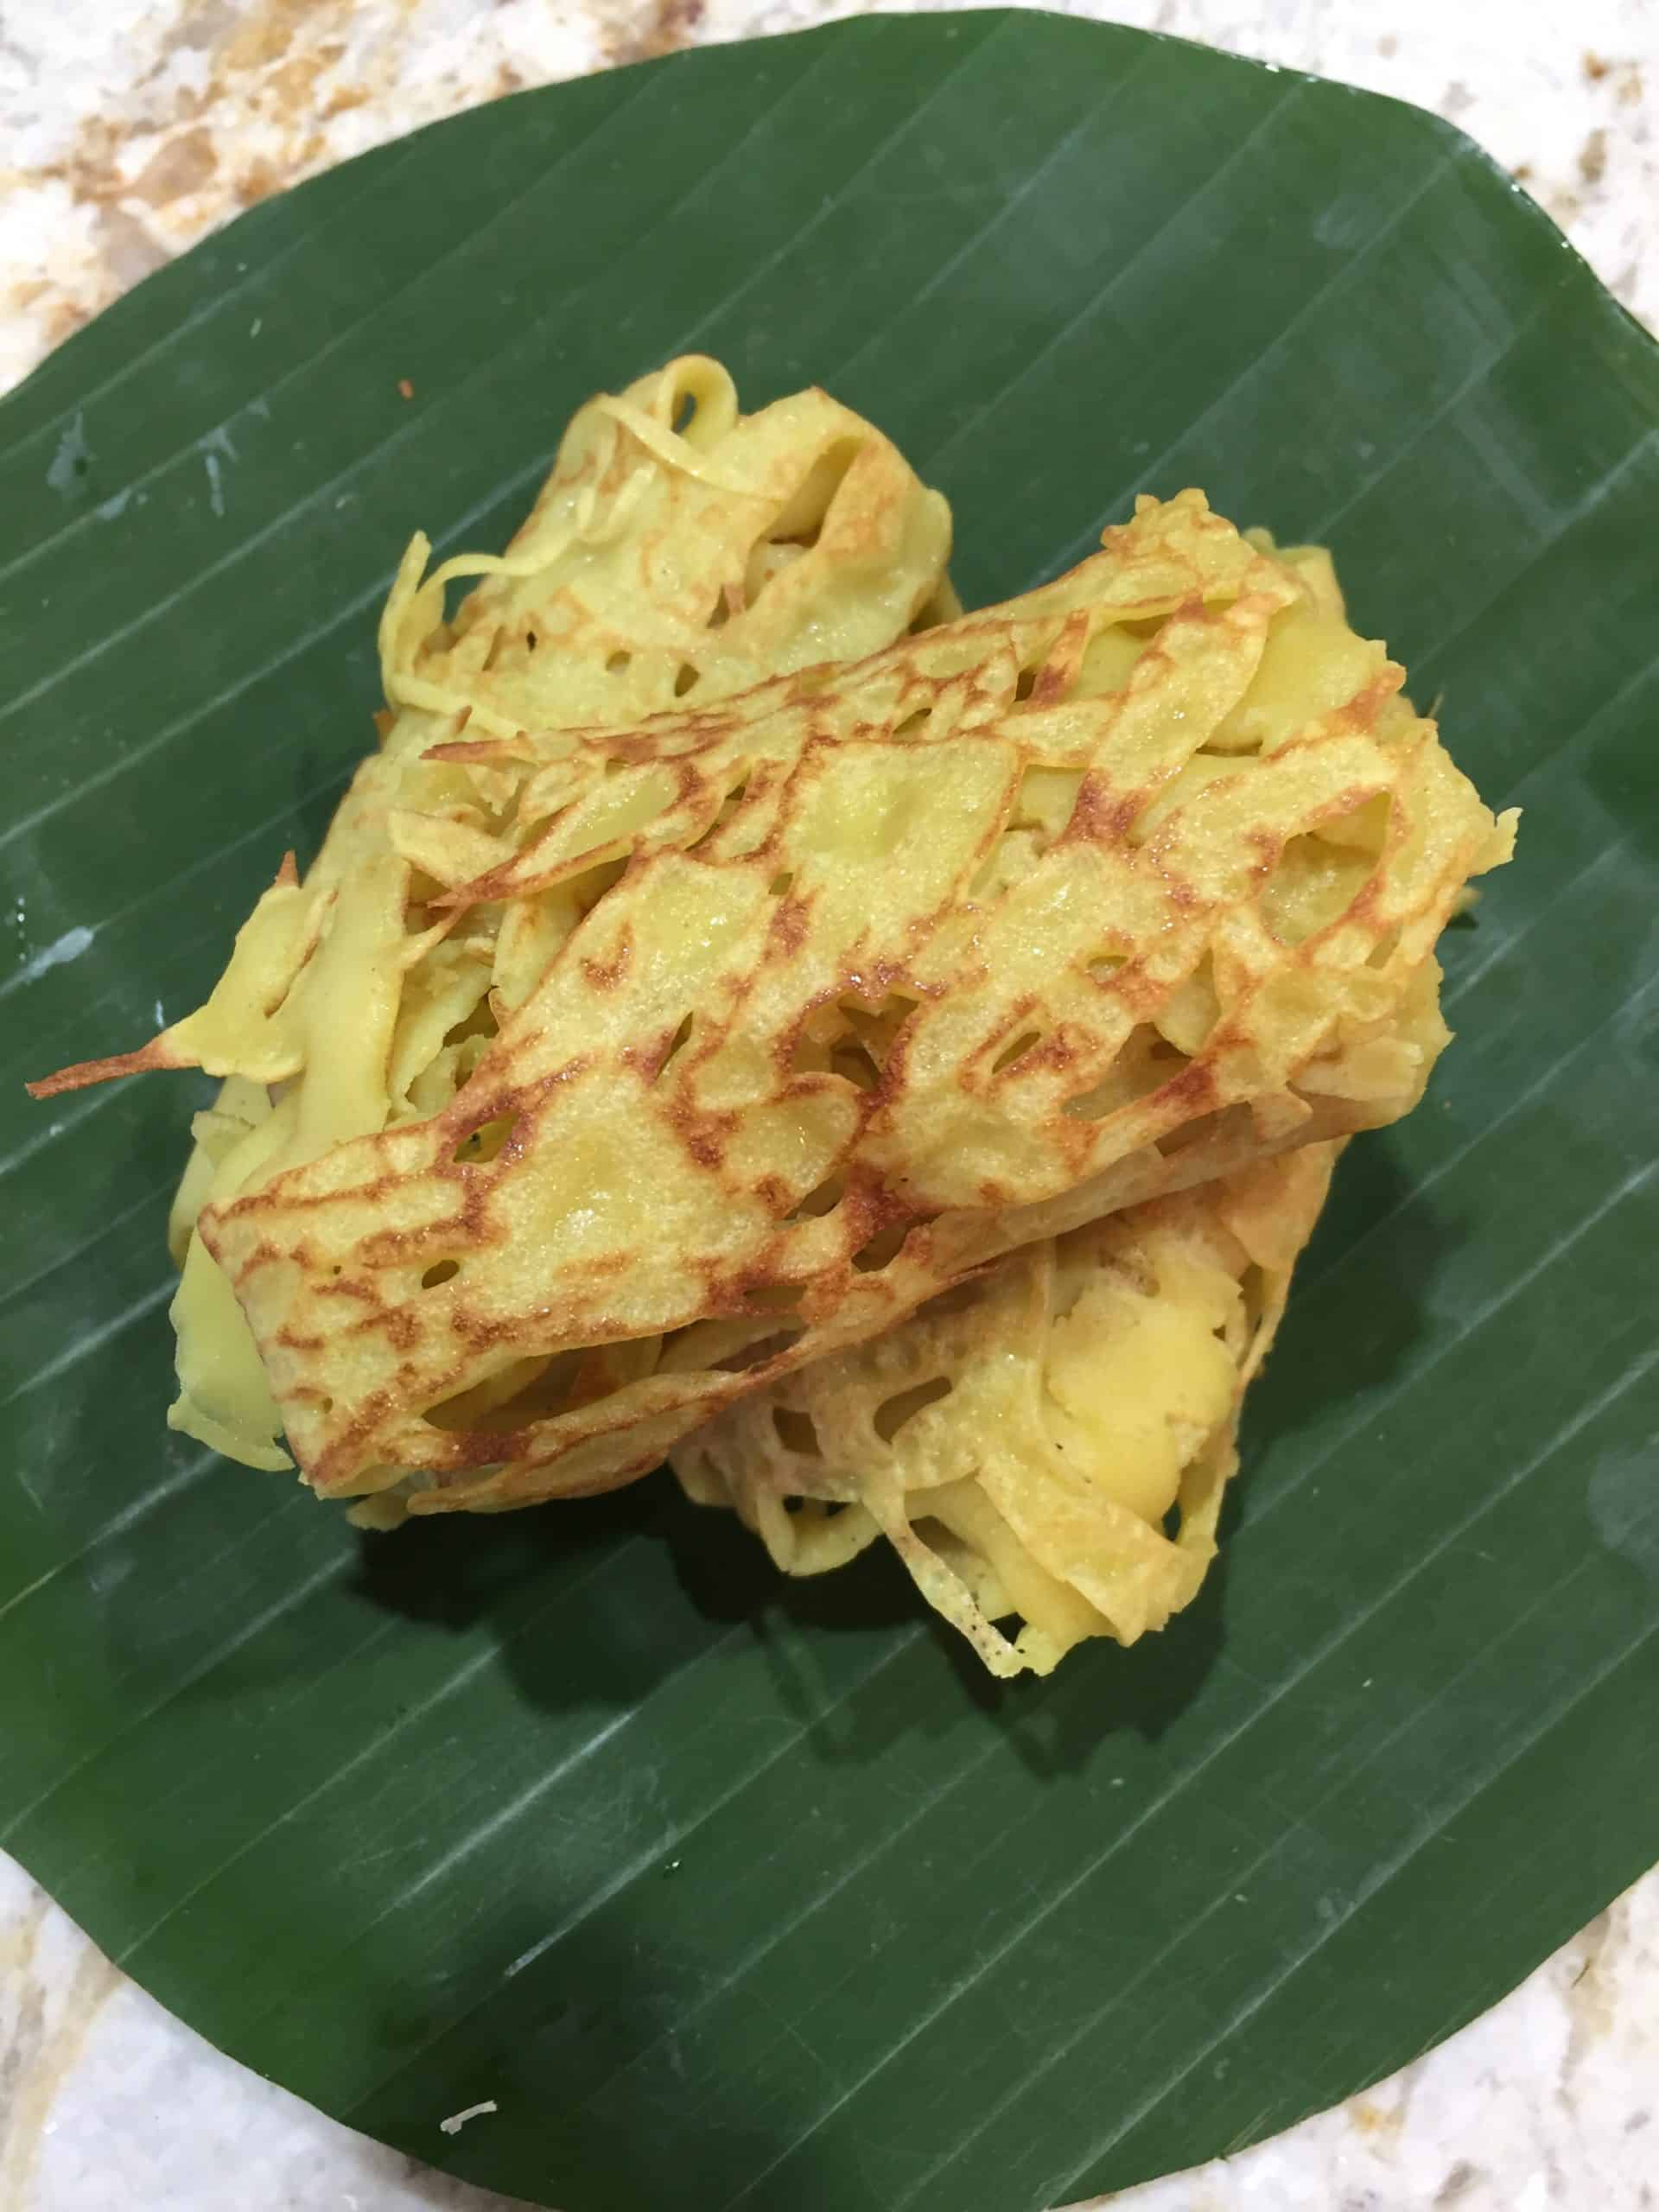 Roti Jala - Malaysian net pancakes